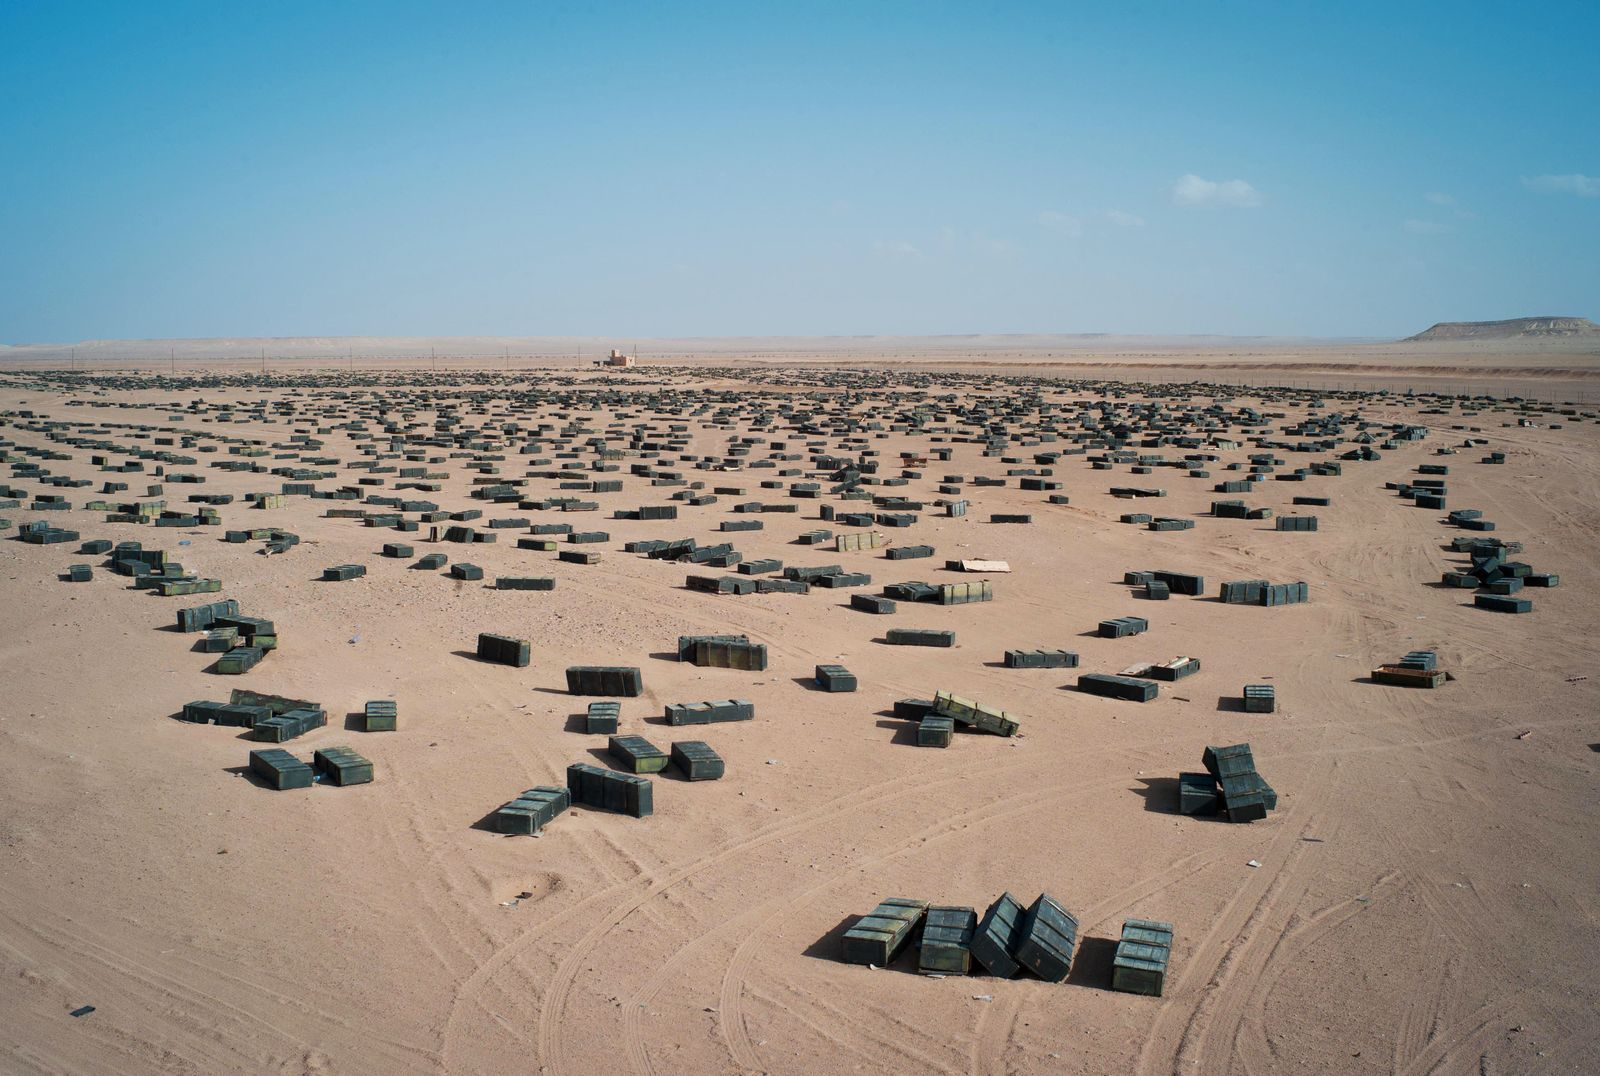 Libyen / Munition / Waffen / Wüste